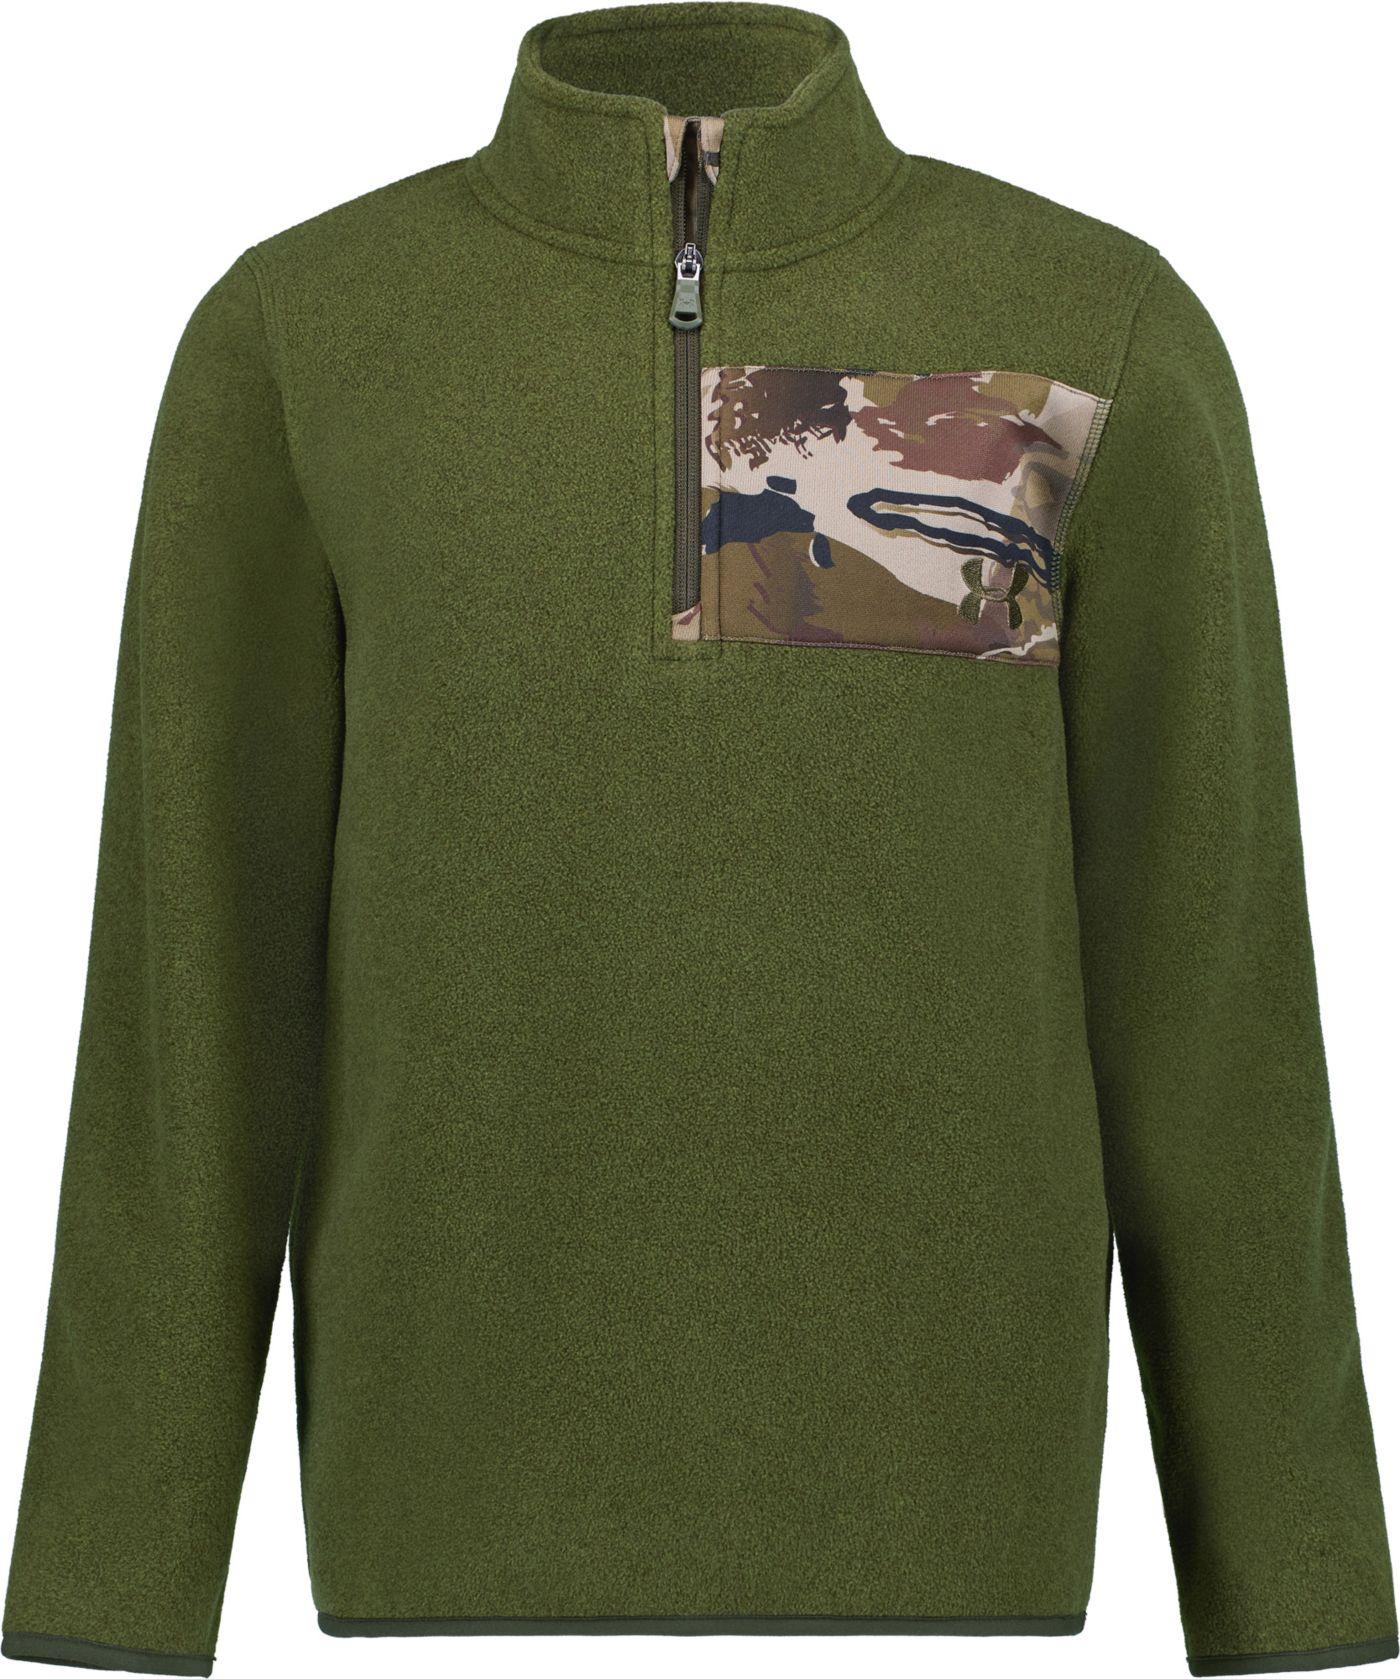 Under Armour Boys' Camo 1/4 Zip Long Sleeve Fleece Jacket